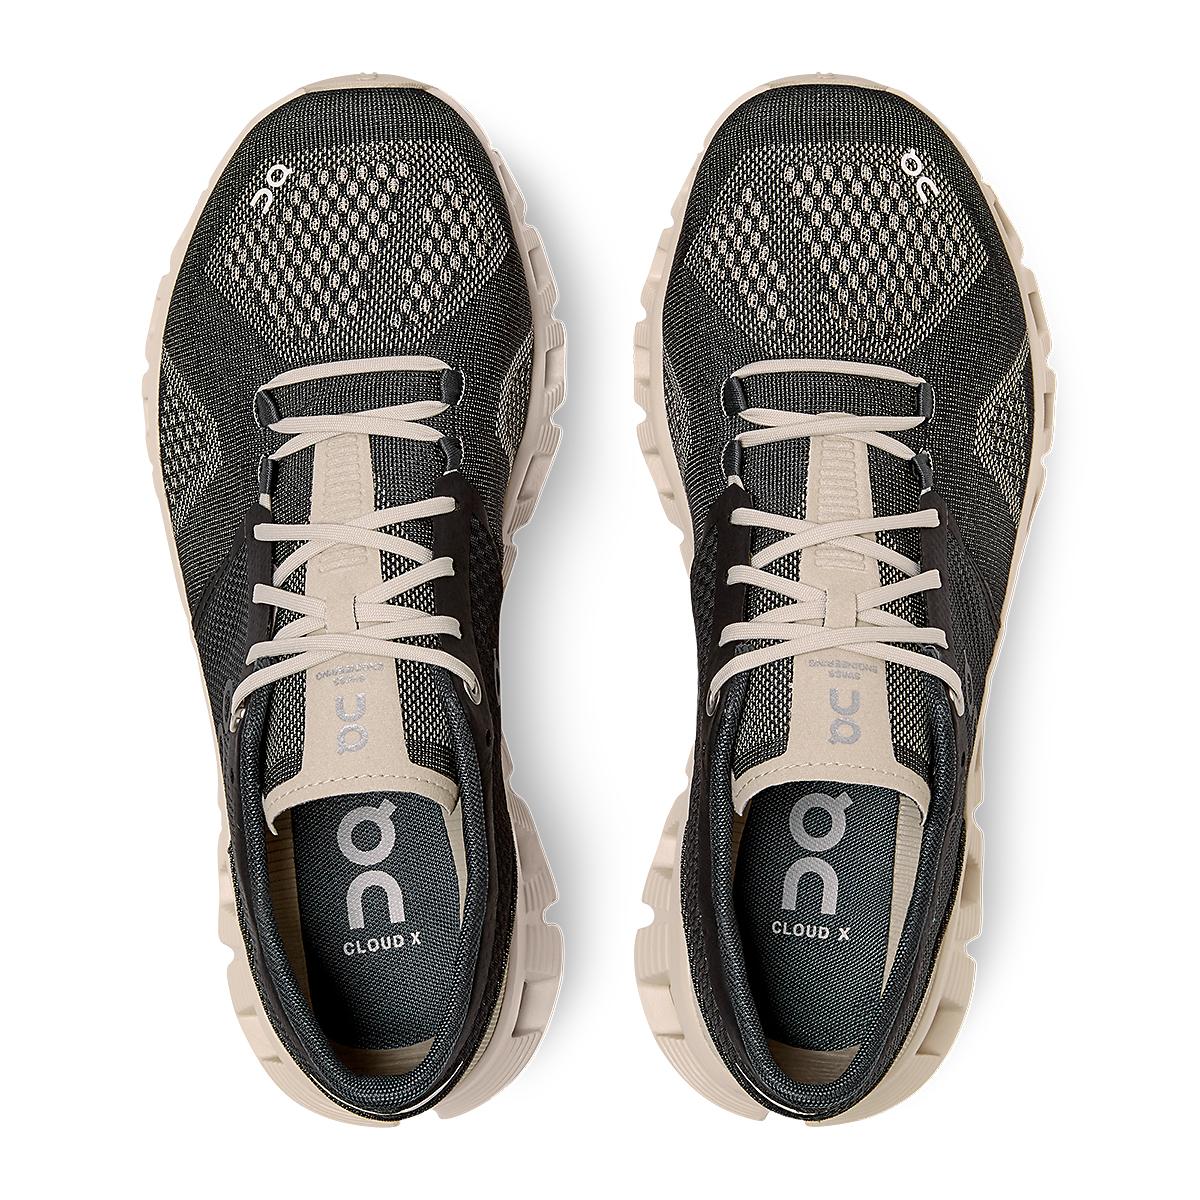 Women's On Cloud X 2.0 Running Shoe - Color: Black/Pearl - Size: 5 - Width: Regular, Black/Pearl, large, image 4